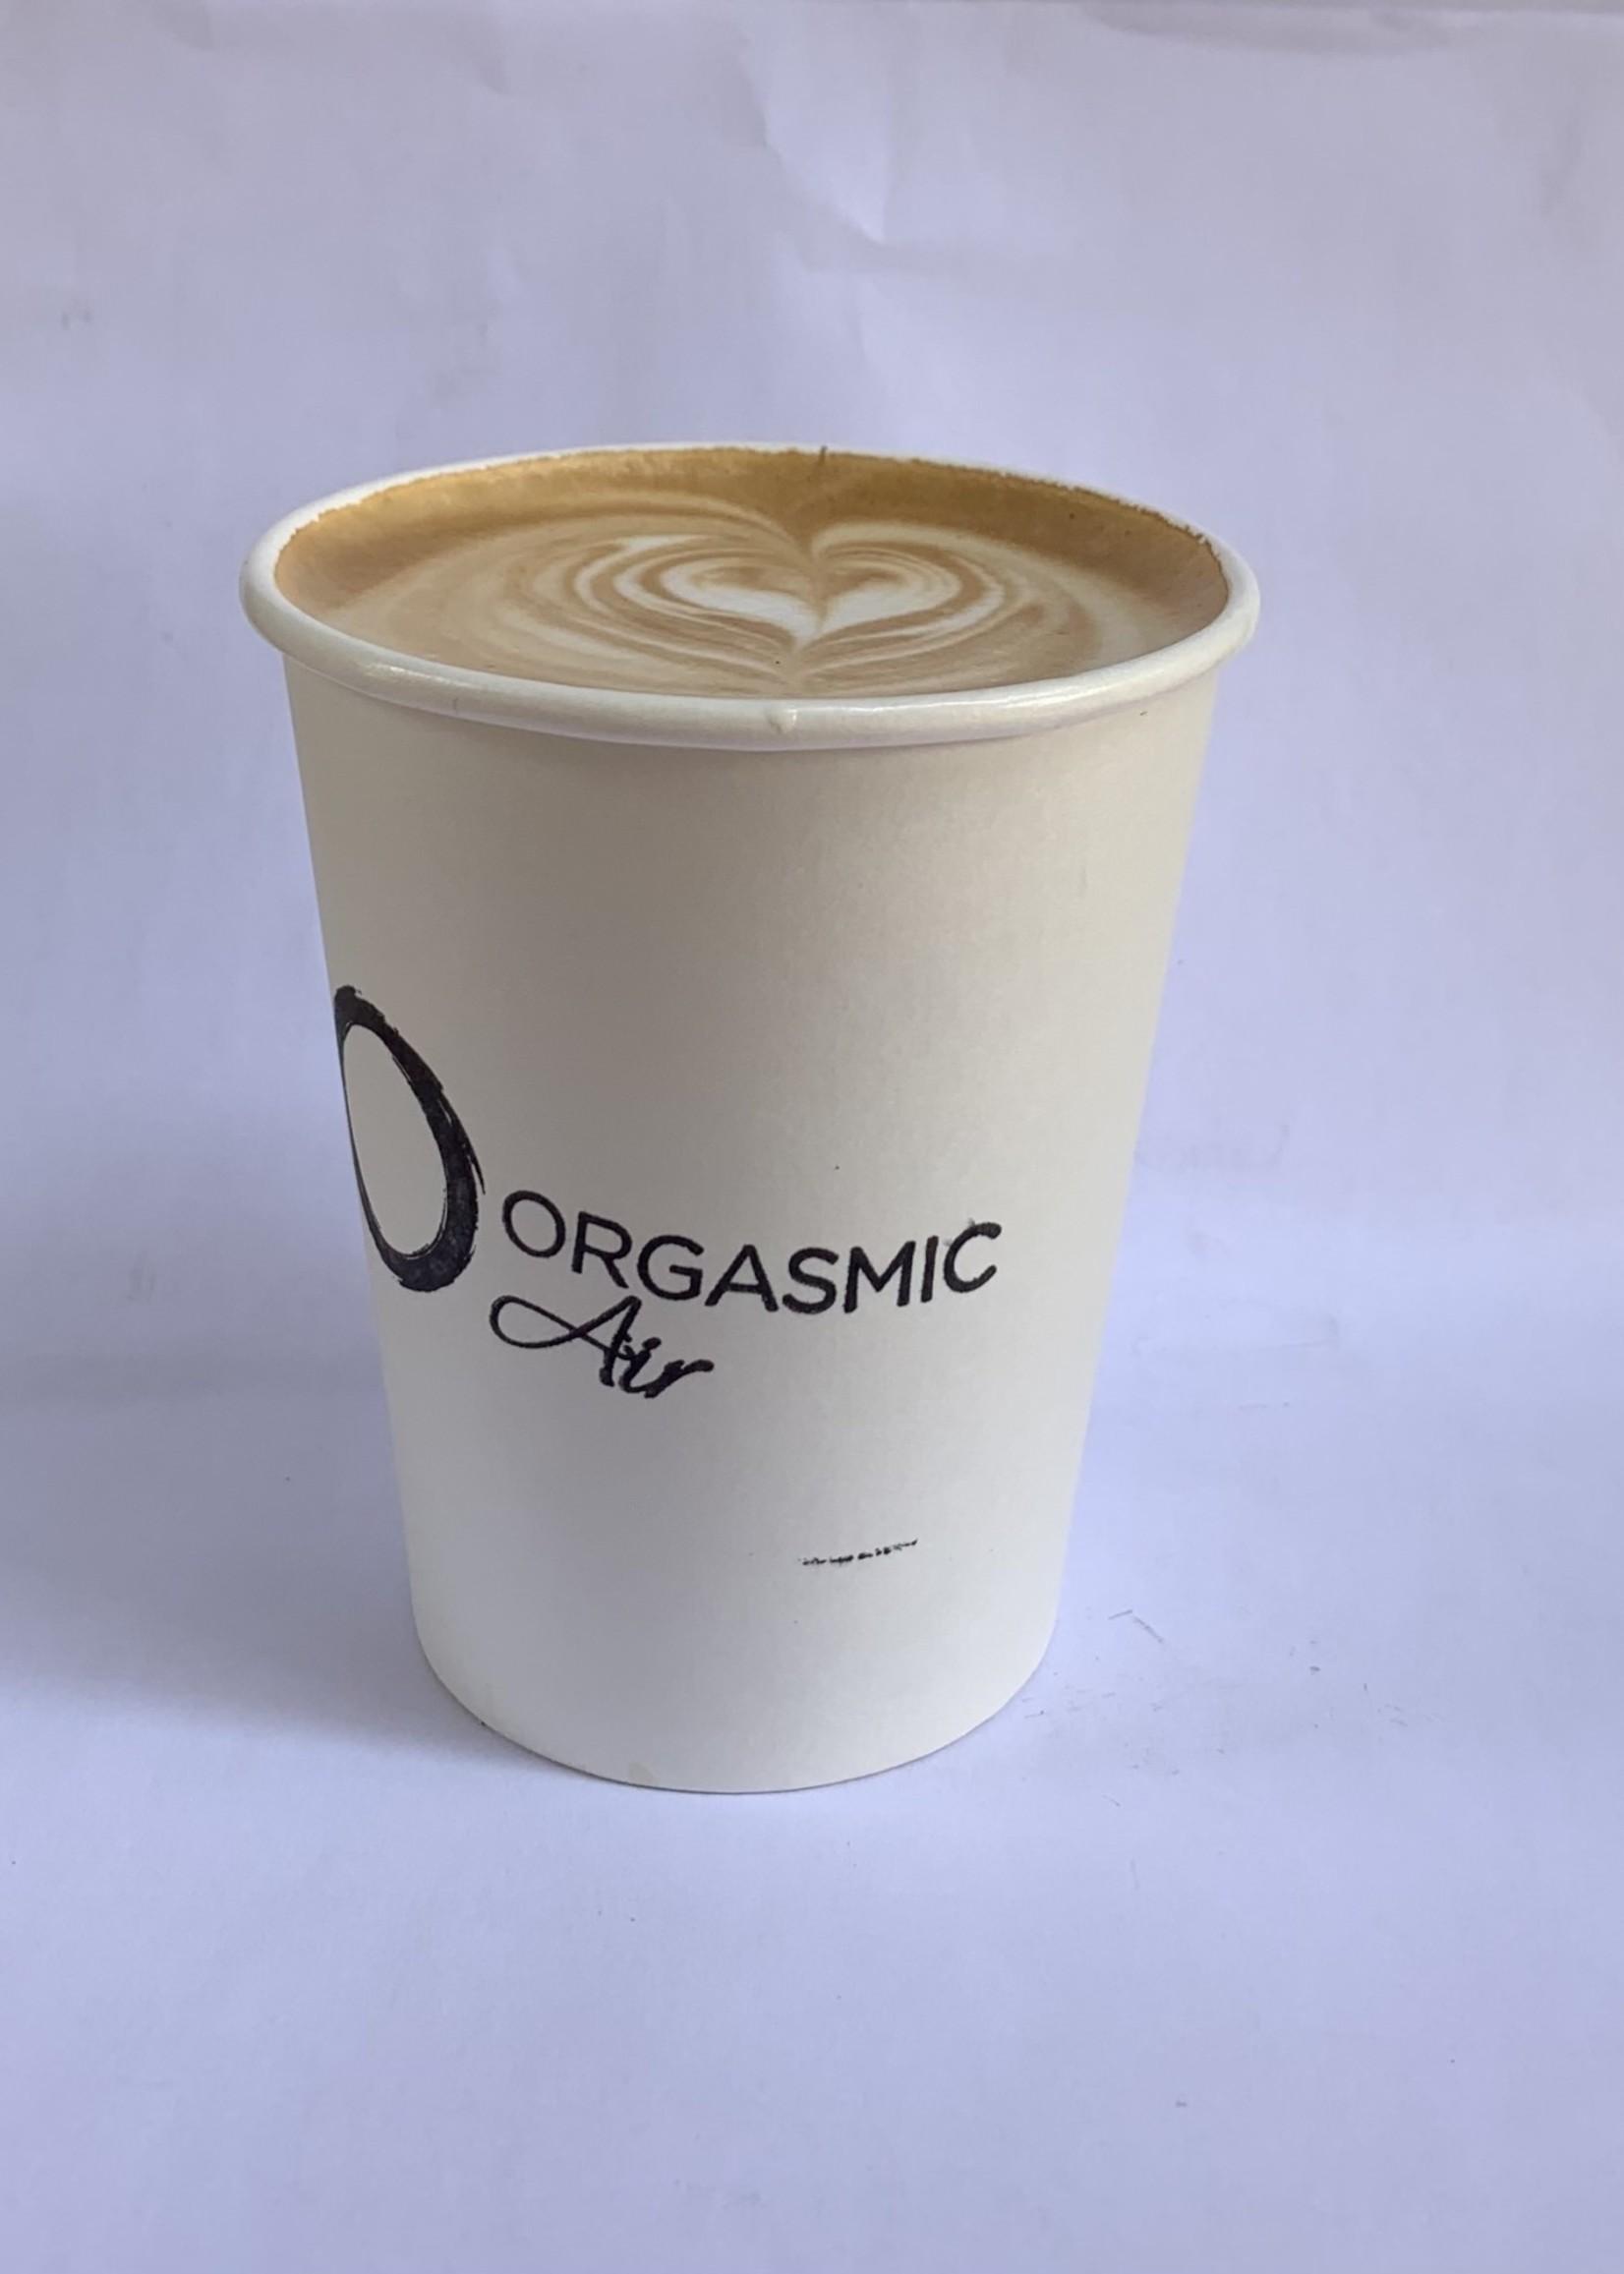 Organic & Air CBD infused latte